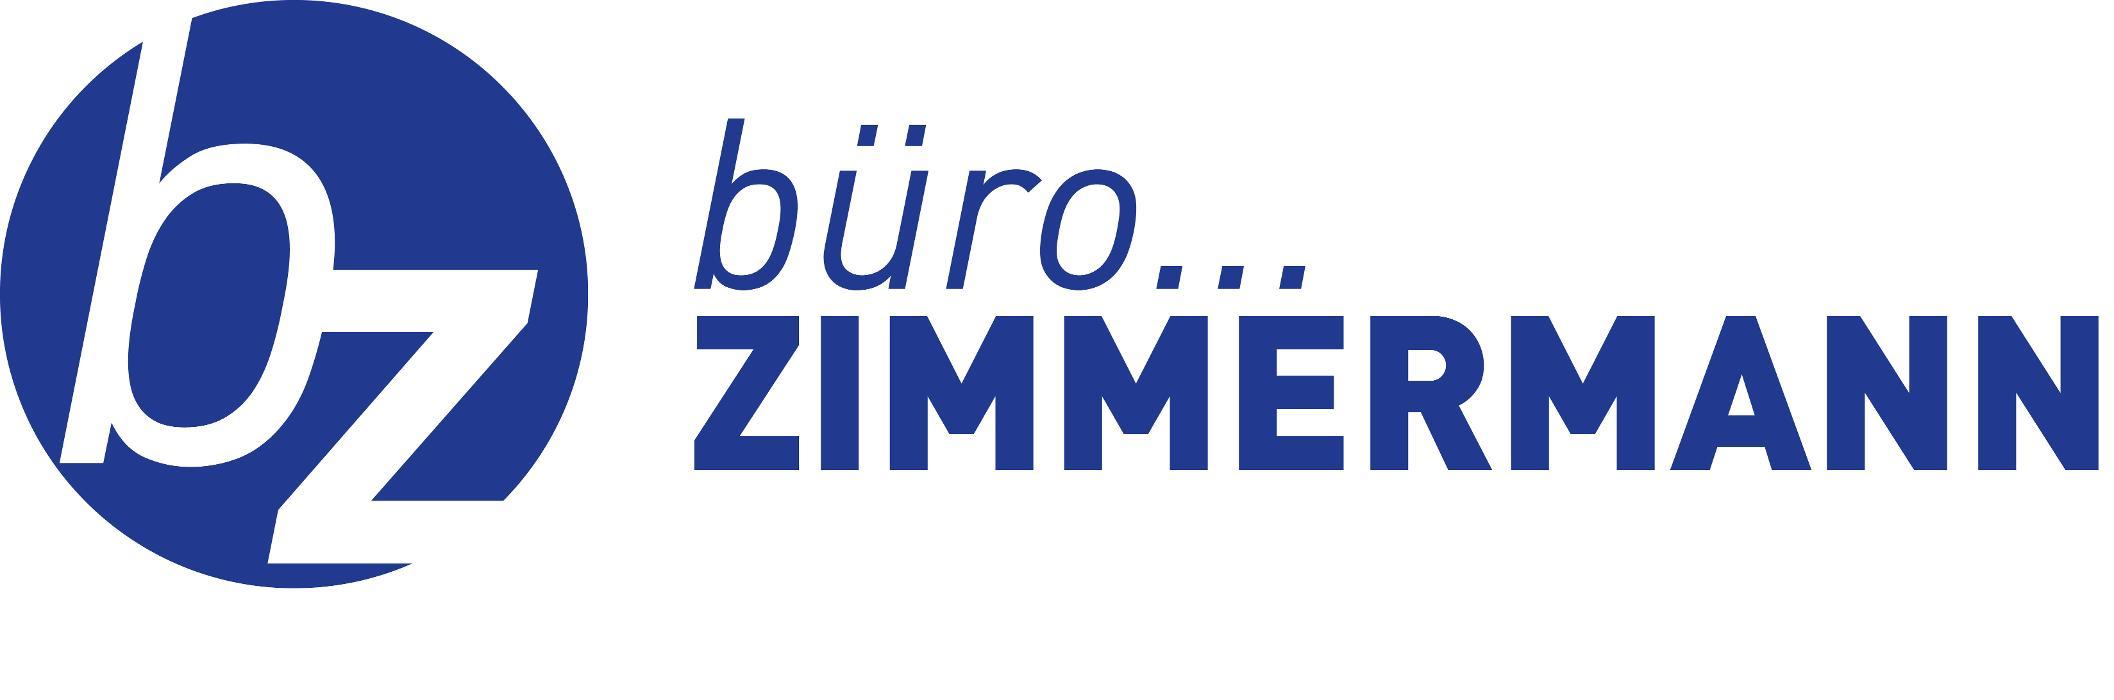 Buro Zimmermann Gmbh Co Kg In Dippoldiswalde